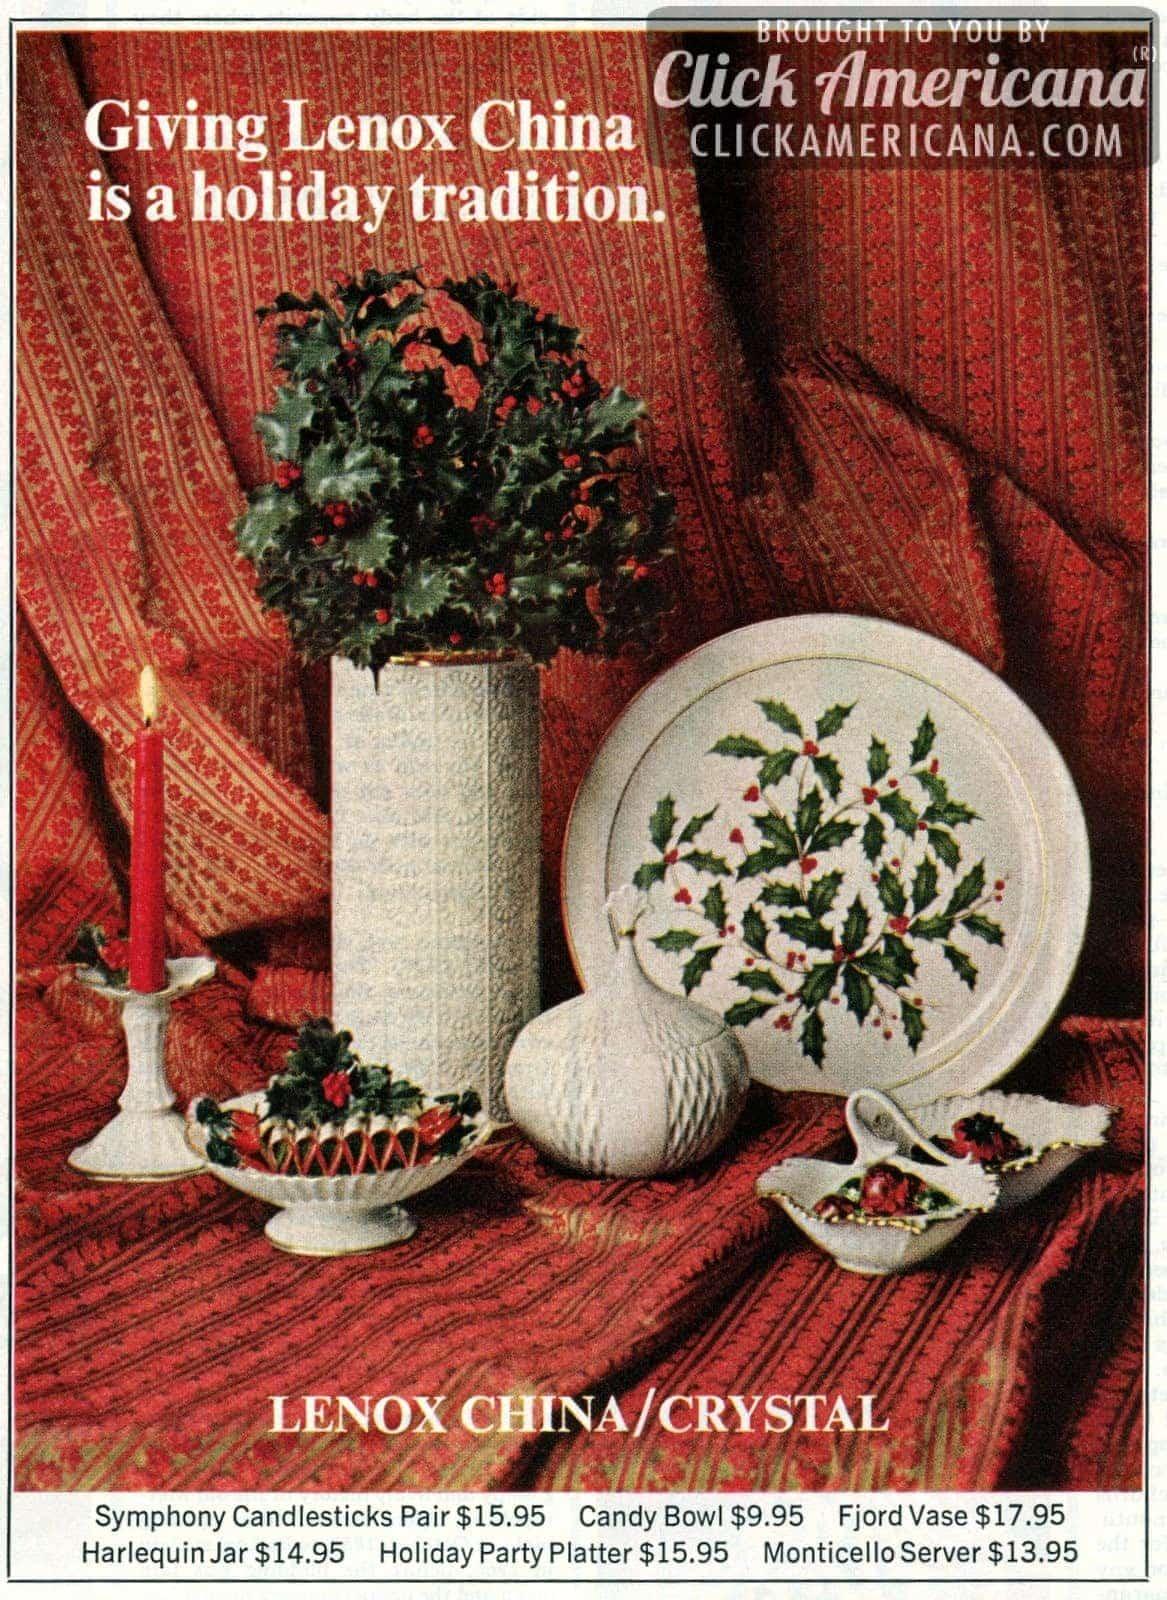 Lenox china is a holiday tradition 1969 1972 click americana reviewsmspy